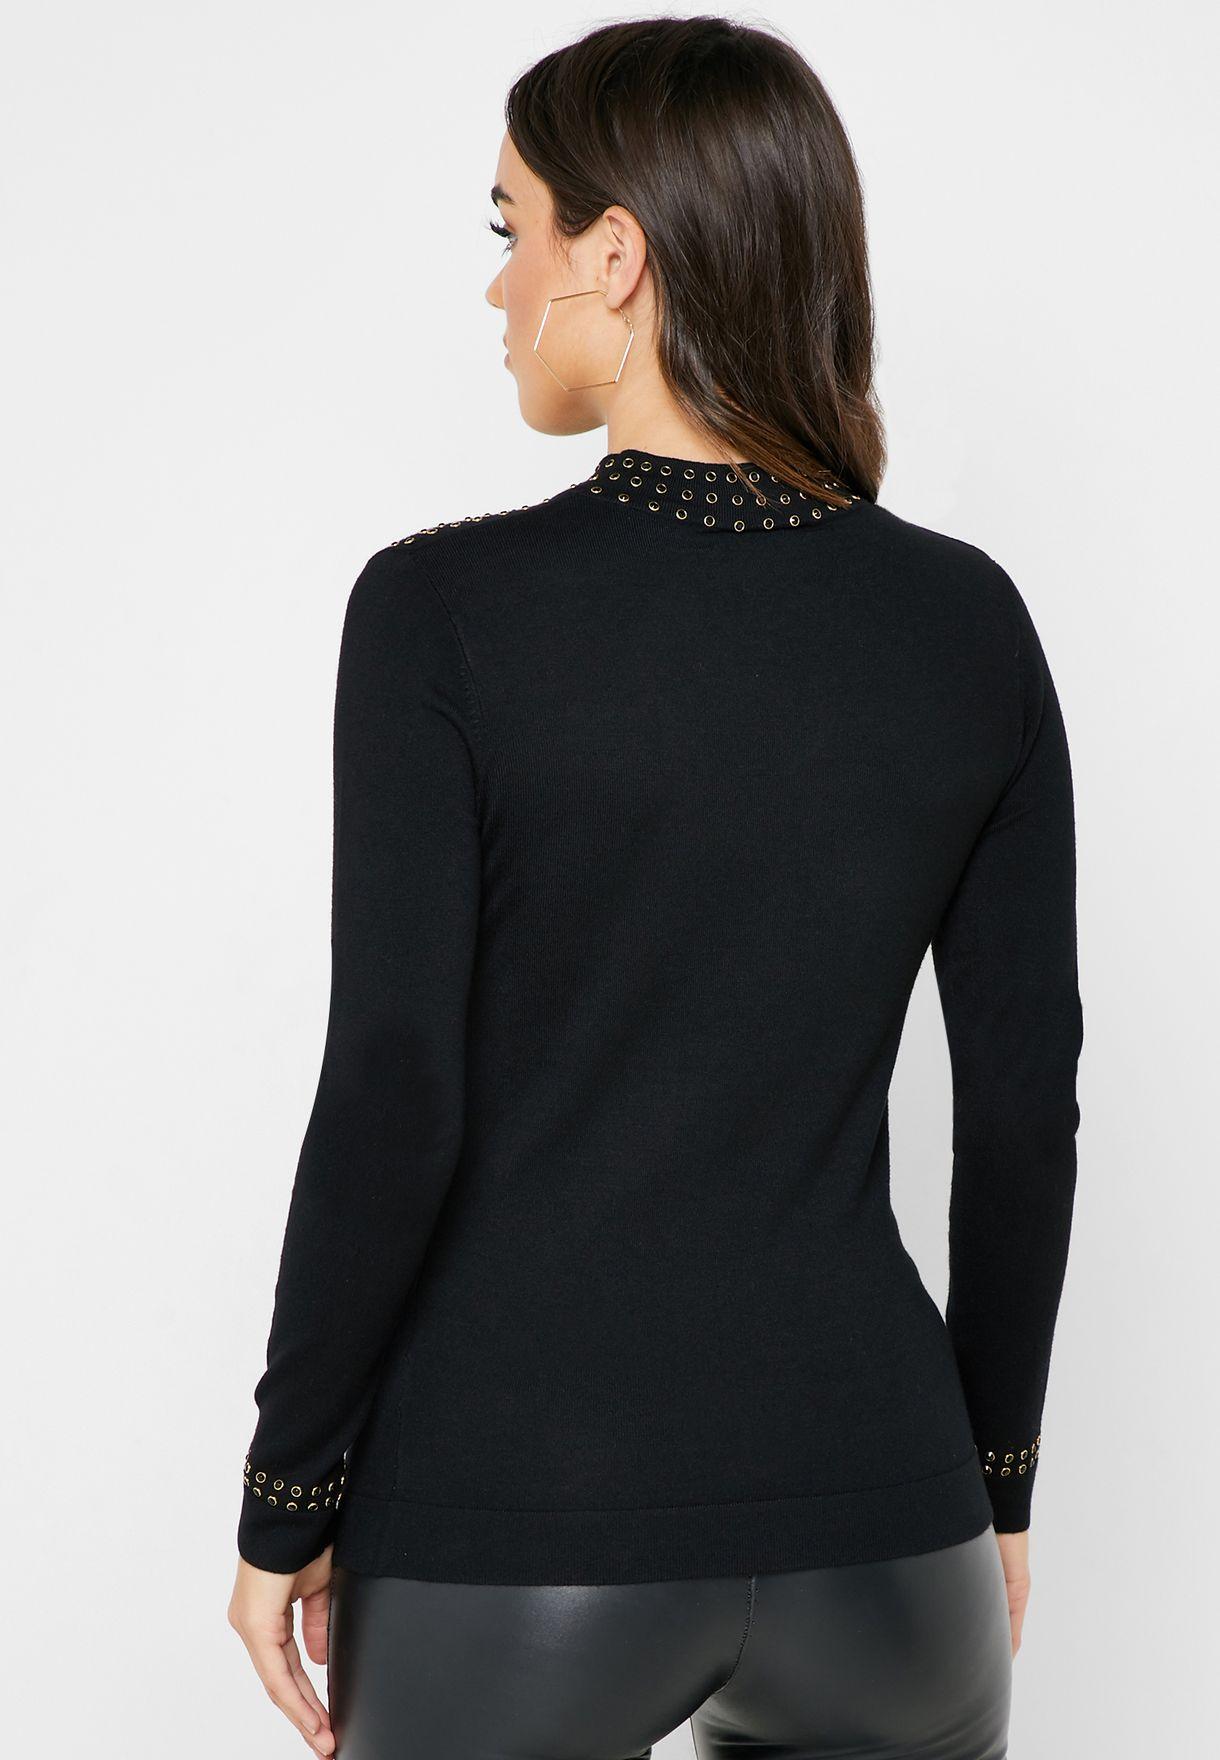 High Neck Stud Detail Sweater